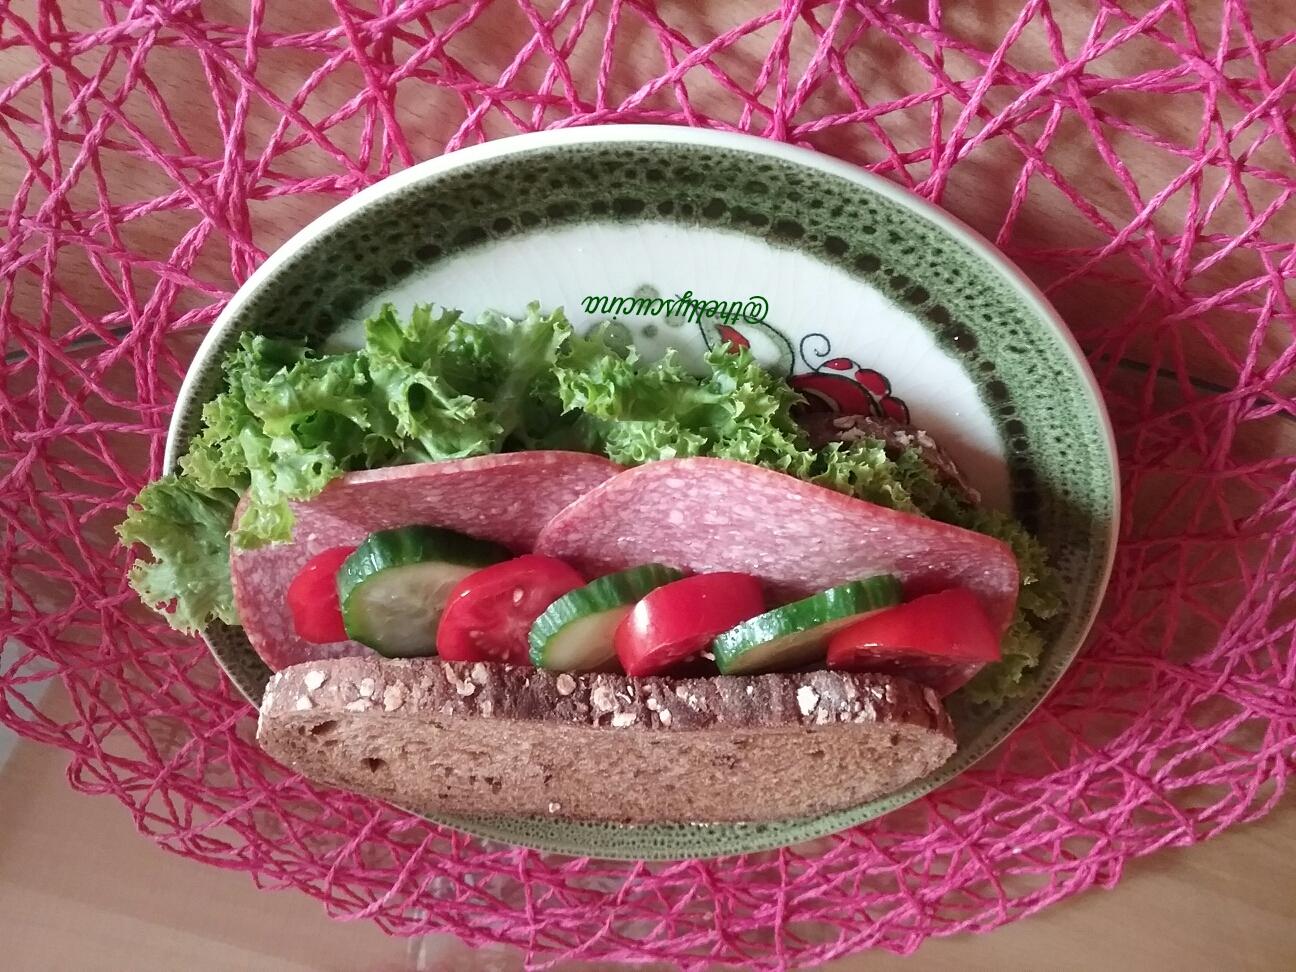 Salami sandwich, hungry, food